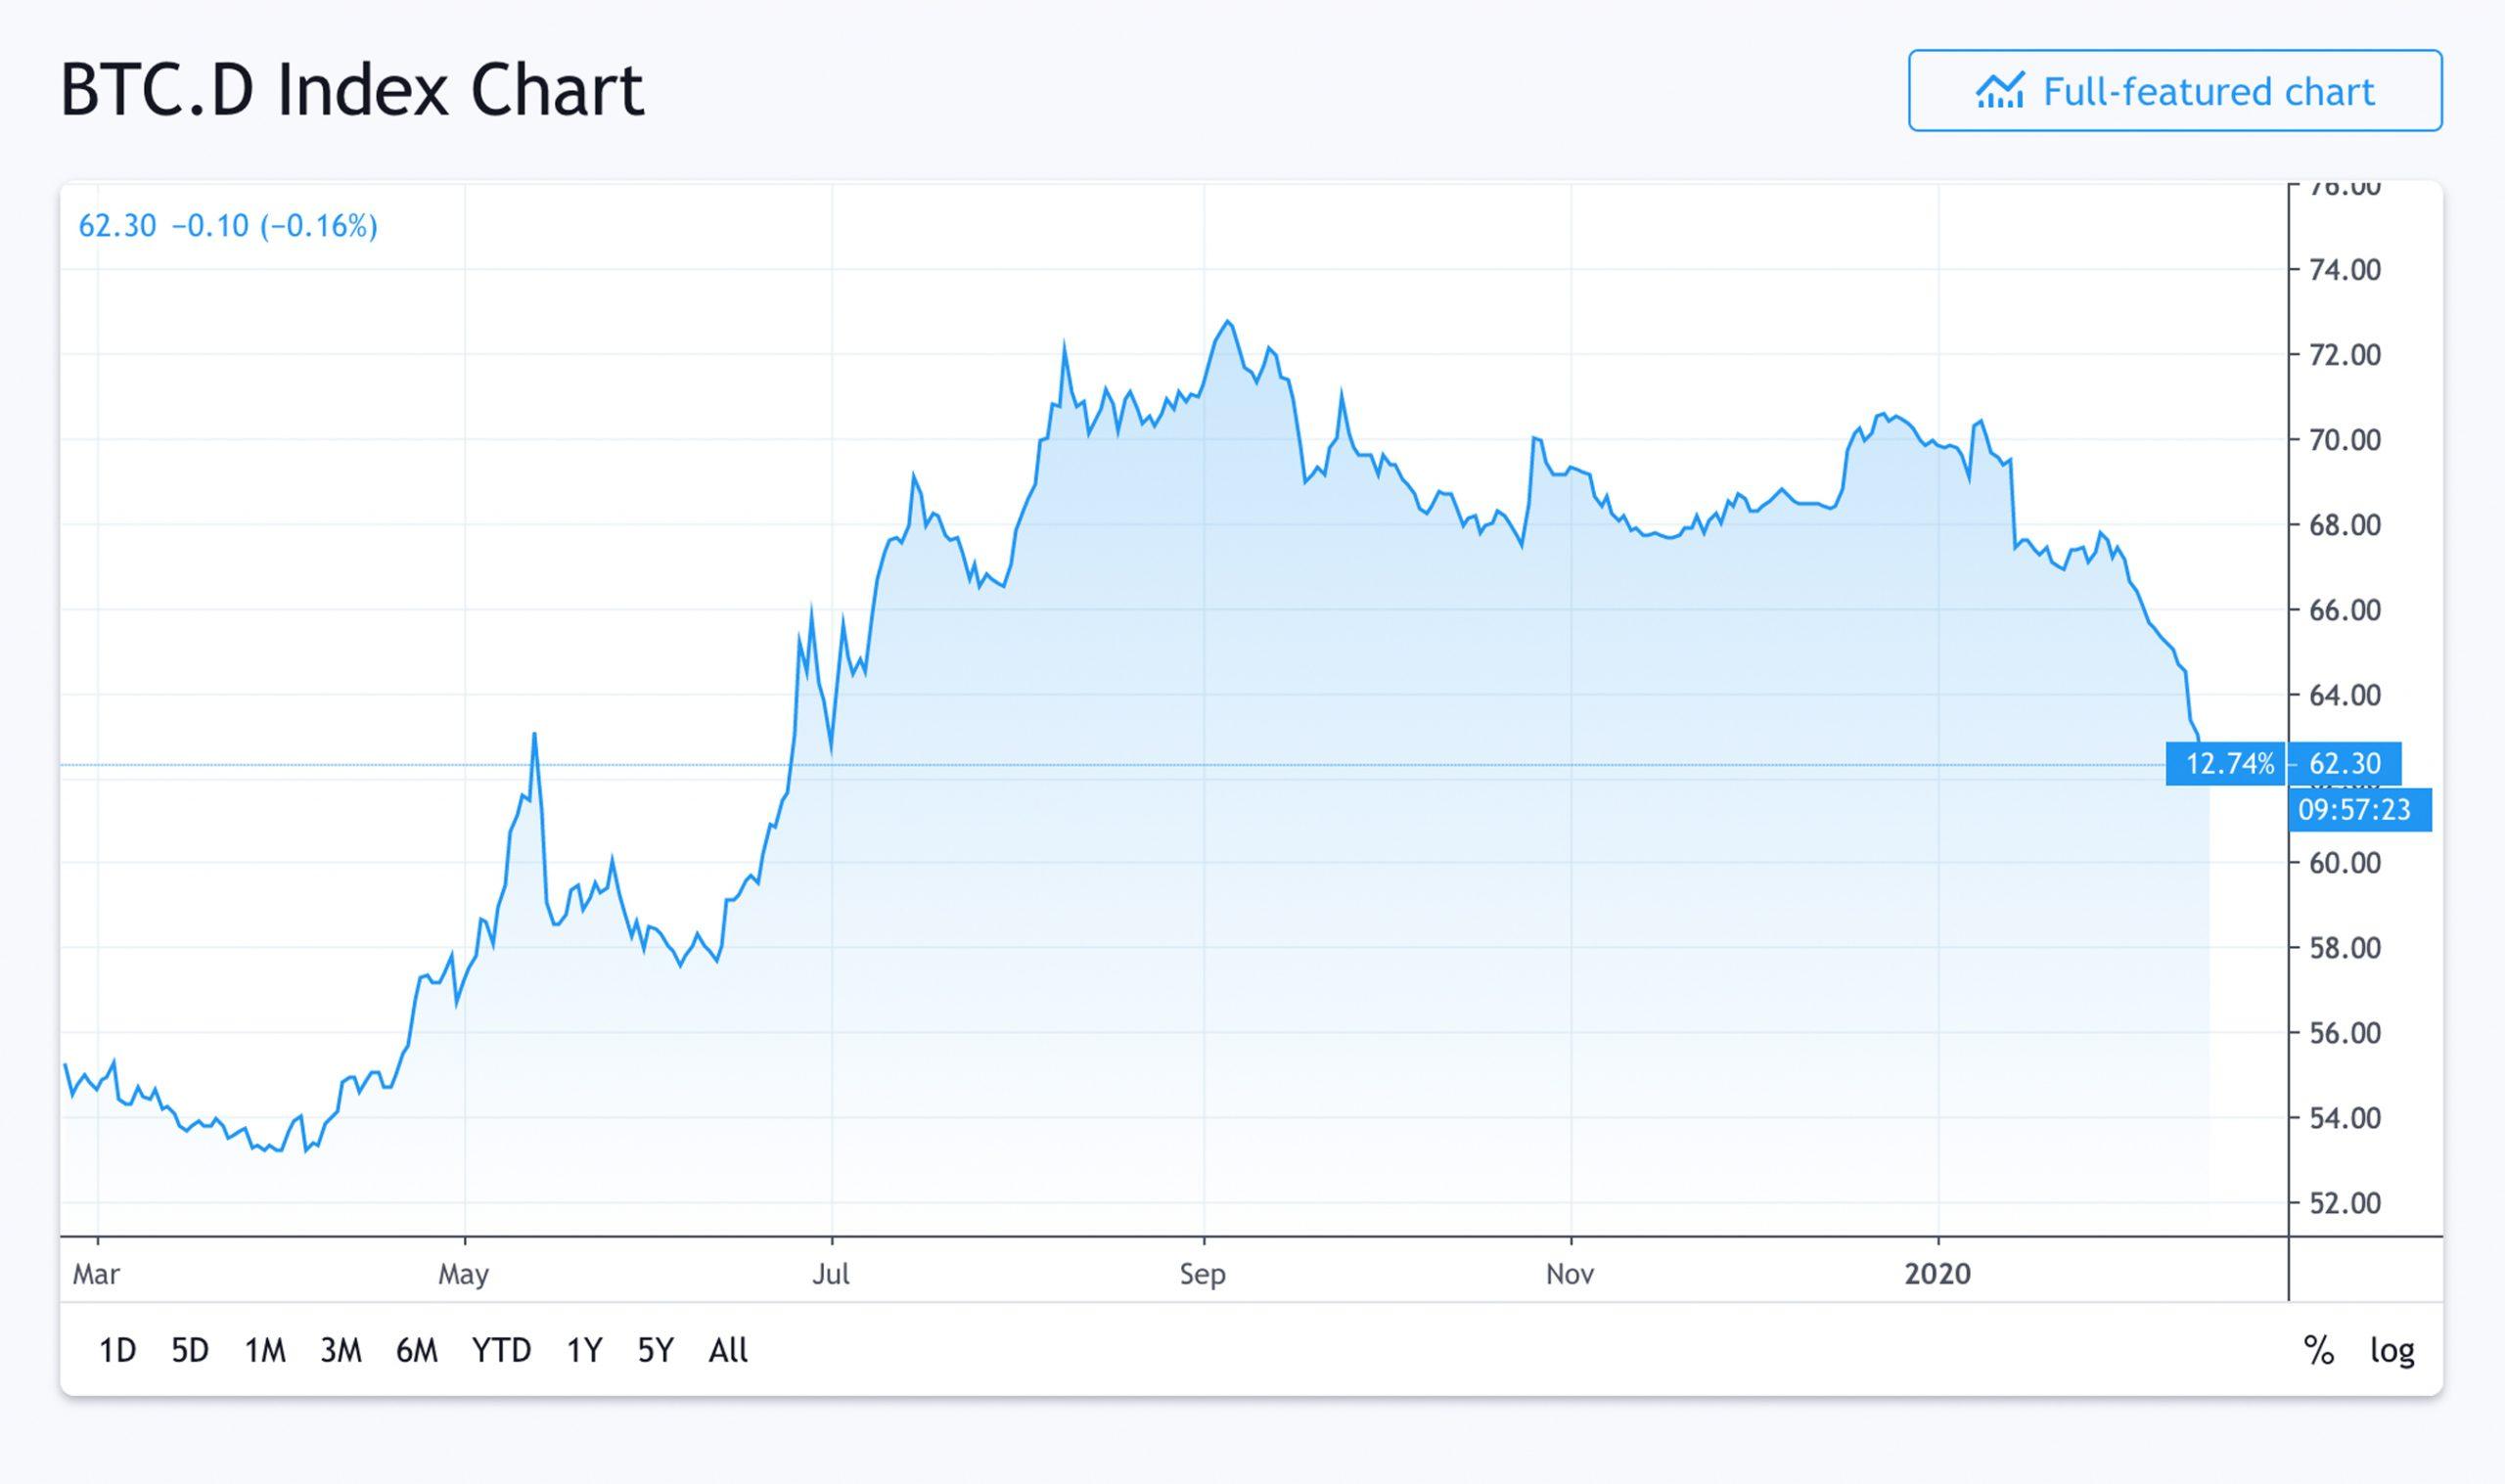 "La cuota de mercado de BTC cae consecutivamente durante 14 días - La relación de dominancia se desliza a 60% de ancho = ""2560"" height = ""1517"" srcset = ""https://blackswanfinances.com/wp-content/uploads/2020/02/domdom-scaled.jpg 2560w, https://news.bitcoin.com/wp -content / uploads / 2020/02 / domdom-300x178.jpg 300w, https://news.bitcoin.com/wp-content/uploads/2020/02/domdom-1024x607.jpg 1024w, https: //news.bitcoin .com / wp-content / uploads / 2020/02 / domdom-768x455.jpg 768w, https://news.bitcoin.com/wp-content/uploads/2020/02/domdom-1536x910.jpg 1536w, https: / /news.bitcoin.com/wp-content/uploads/2020/02/domdom-2048x1214.jpg 2048w, https://news.bitcoin.com/wp-content/uploads/2020/02/domdom-696x412.jpg 696w , https://news.bitcoin.com/wp-content/uploads/2020/02/domdom-1392x825.jpg 1392w, https://news.bitcoin.com/wp-content/uploads/2020/02/domdom- 1068x633.jpg 1068w, https://news.bitcoin.com/wp-content/uploads/2020/02/domdom-709x420.jpg 709w, https://news.bitcoin.com/wp-content/uploads/2020/02/domdom-1920x1138 .jpg 1920w ""tamaños ="" (ancho máximo: 2560px) 100vw, 2560px"